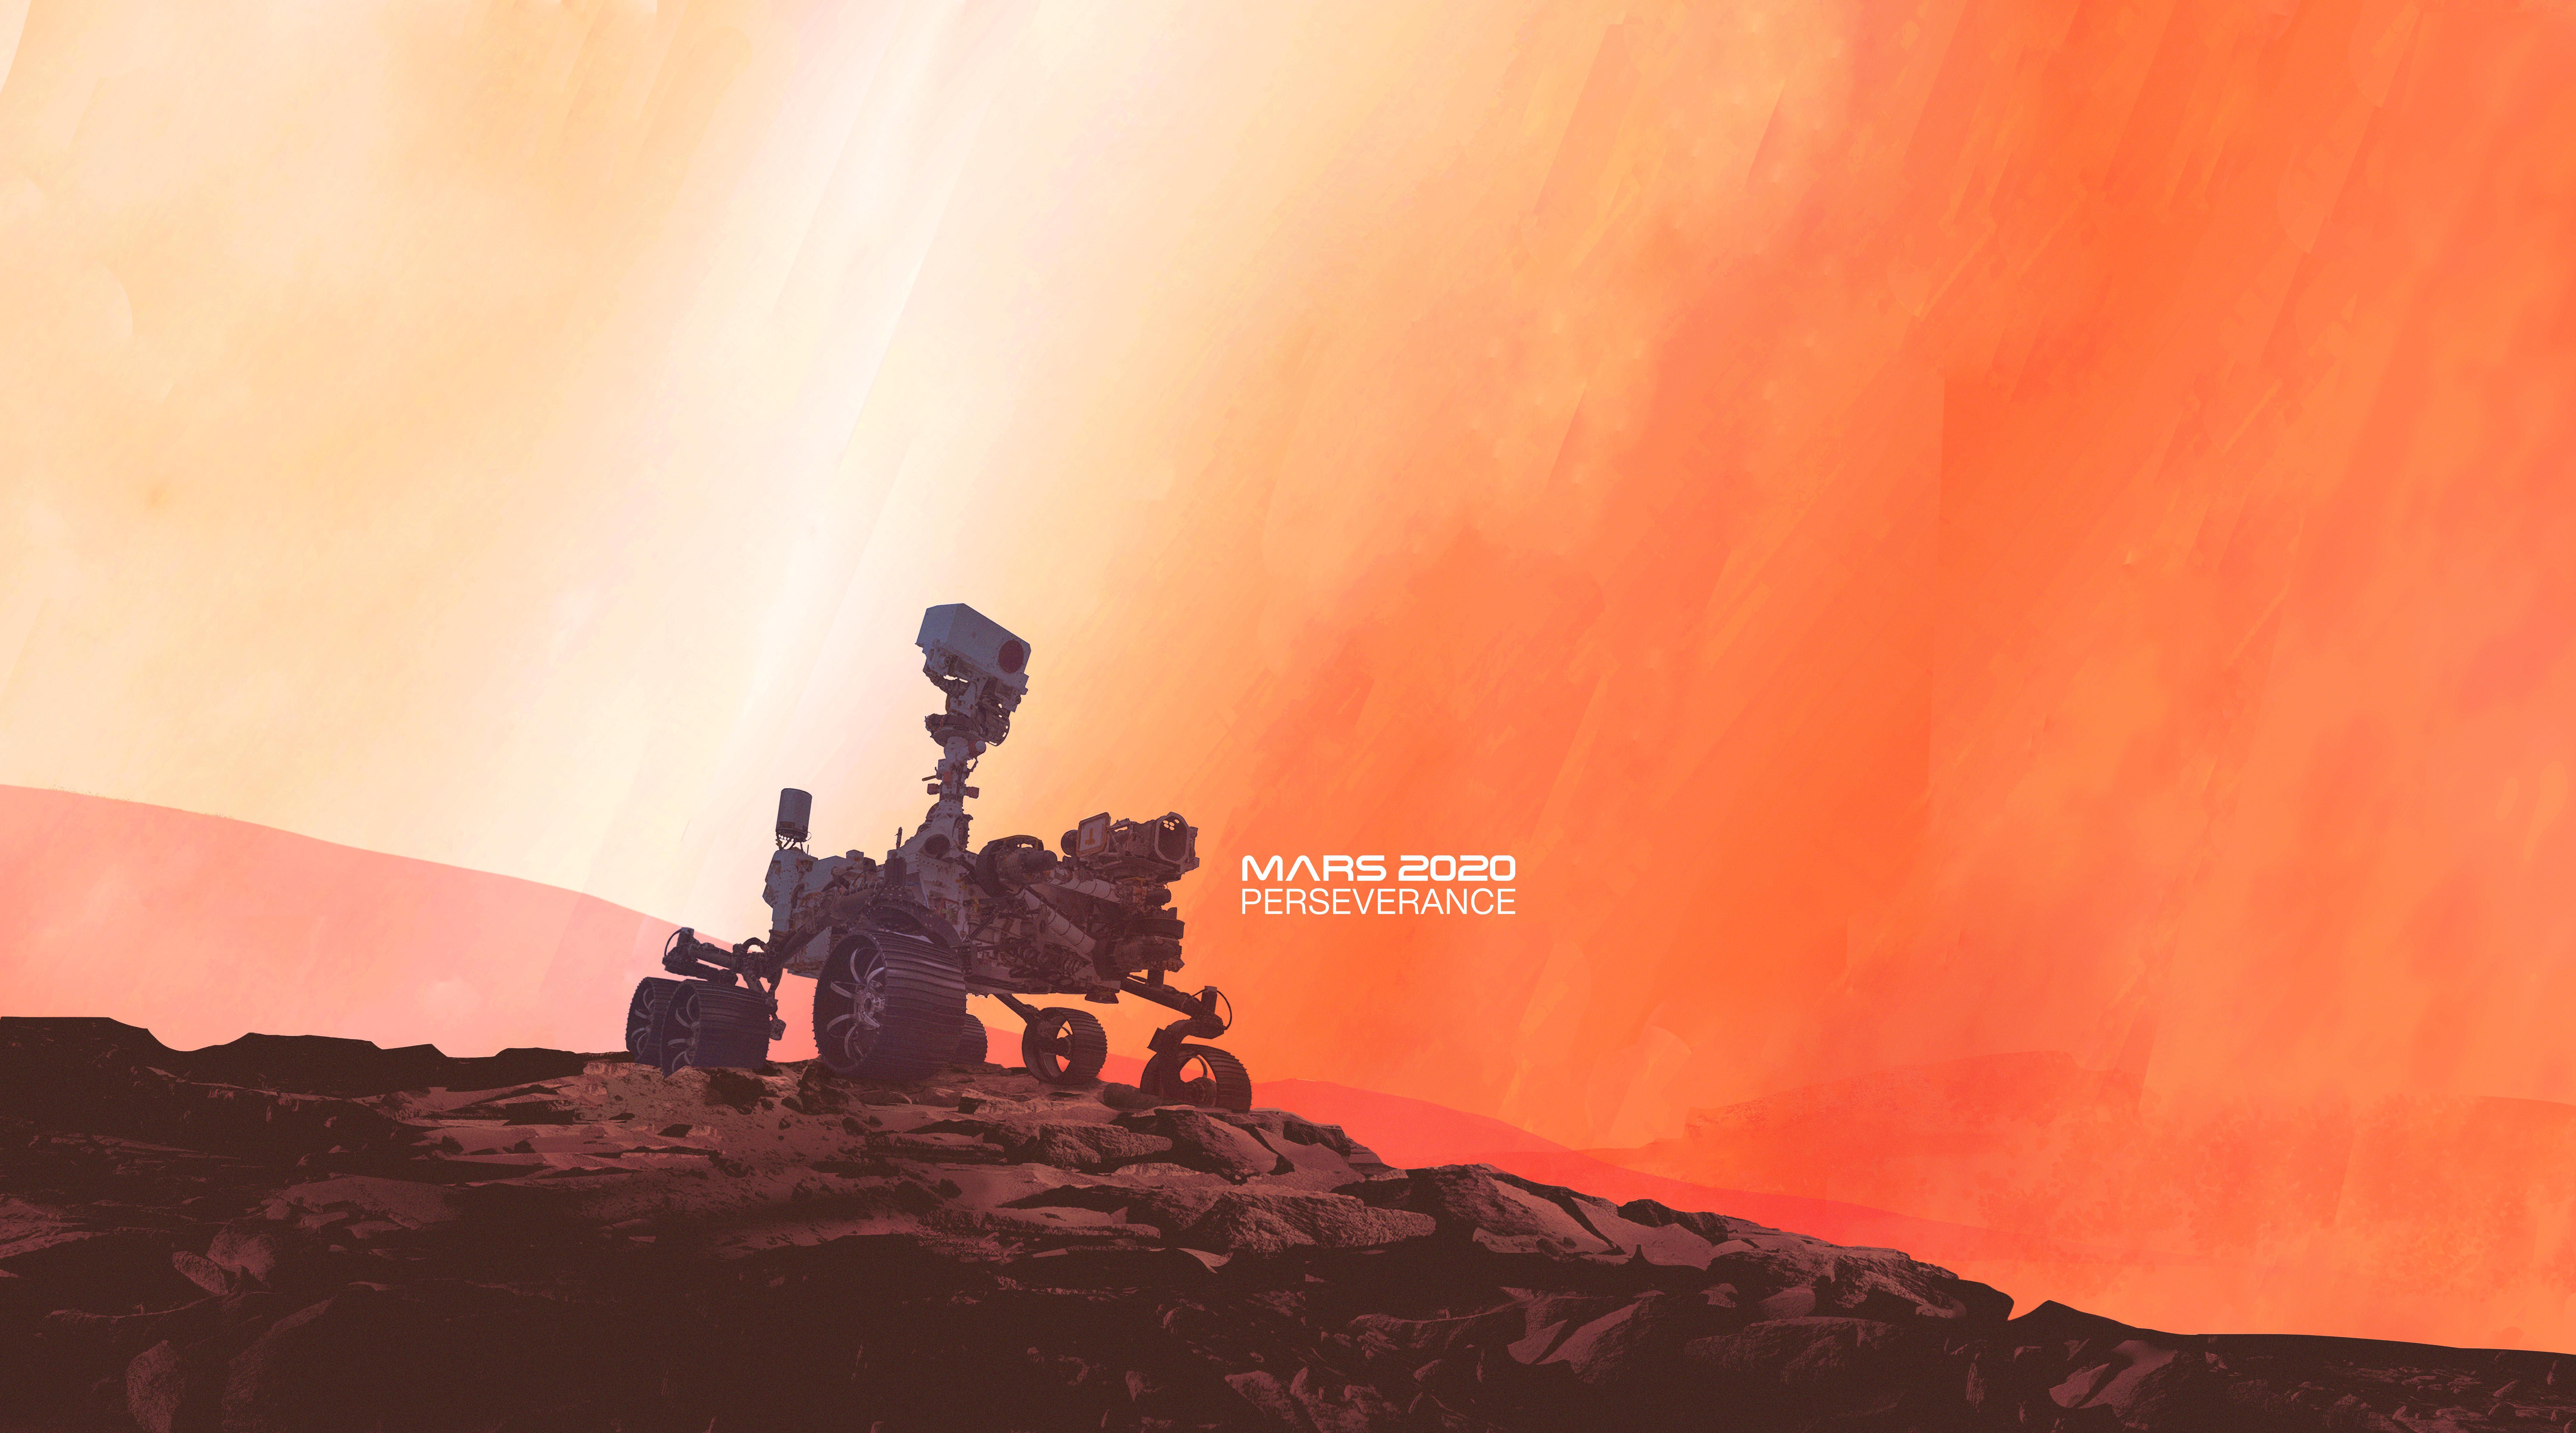 Mars2020 Mars Perseverance poster